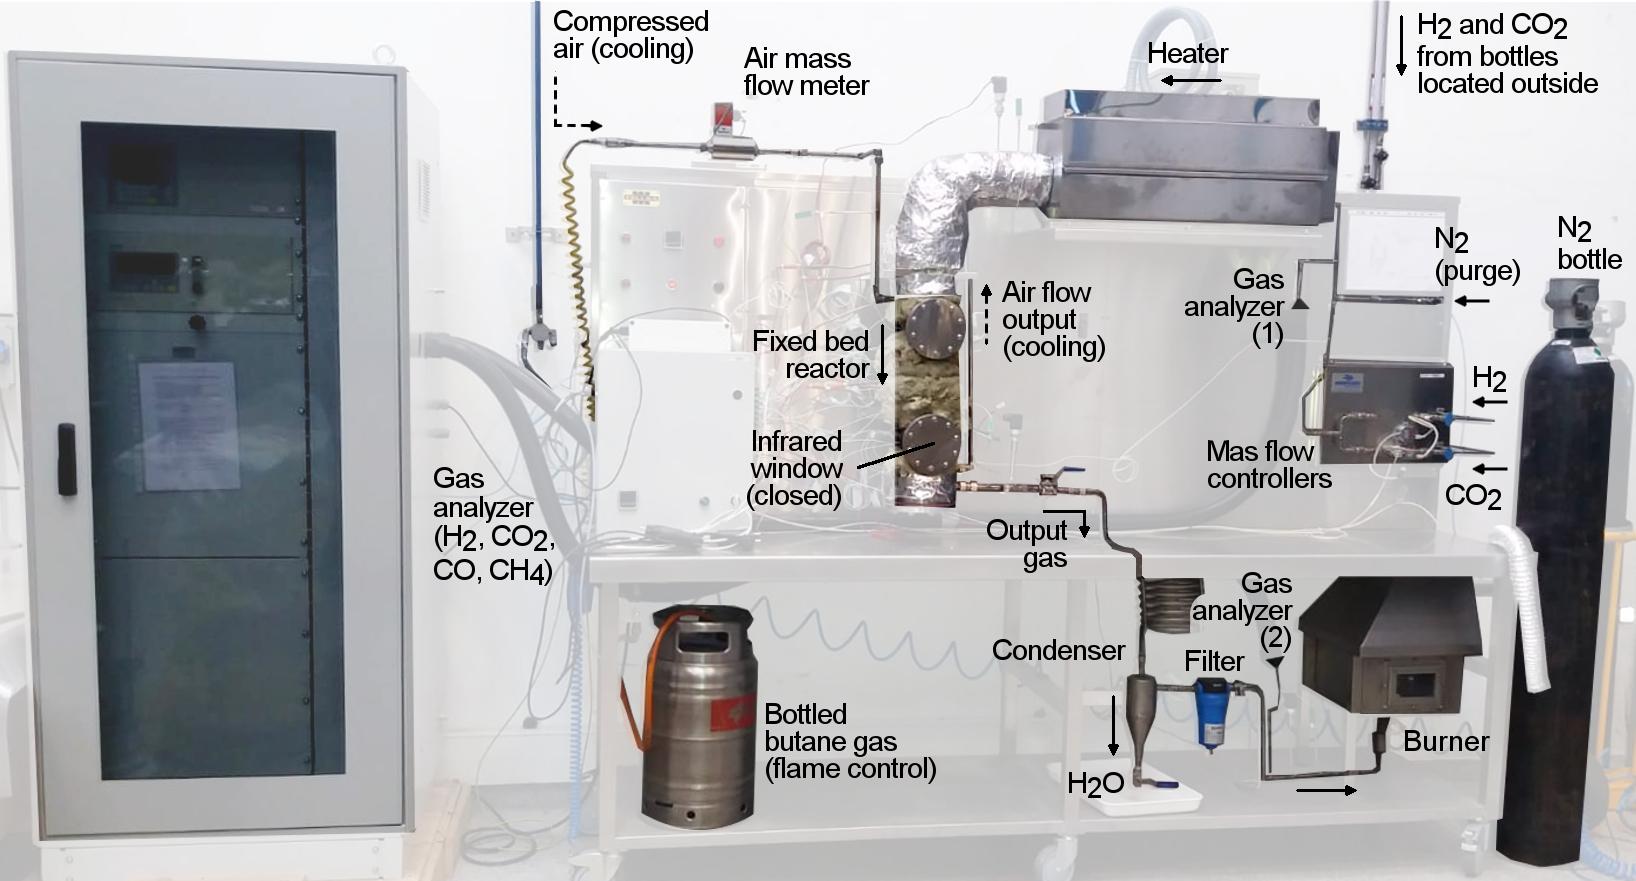 Experimental methanation plant (single tube reactor)